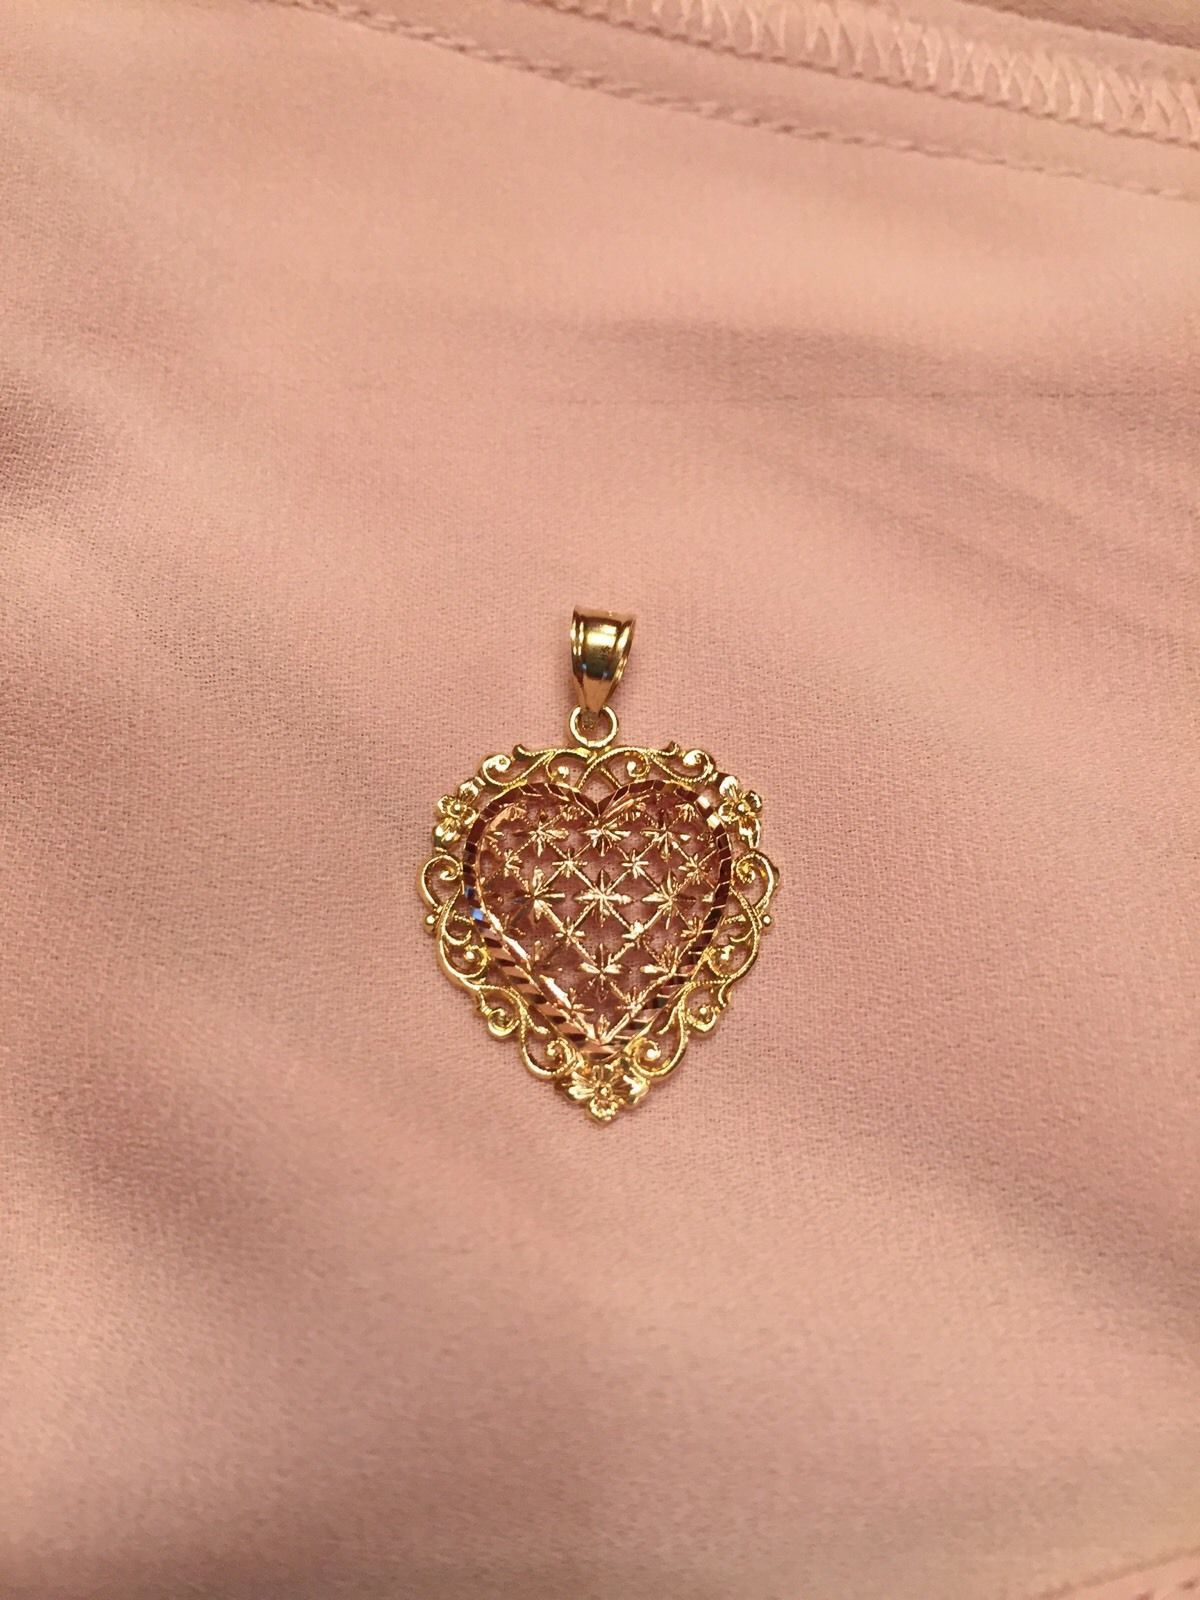 VTG Beverly Hills Gold 14K Rose/ YELLOW Gold Heart Pendant 30X20MM 2.4 GRAMS EUC